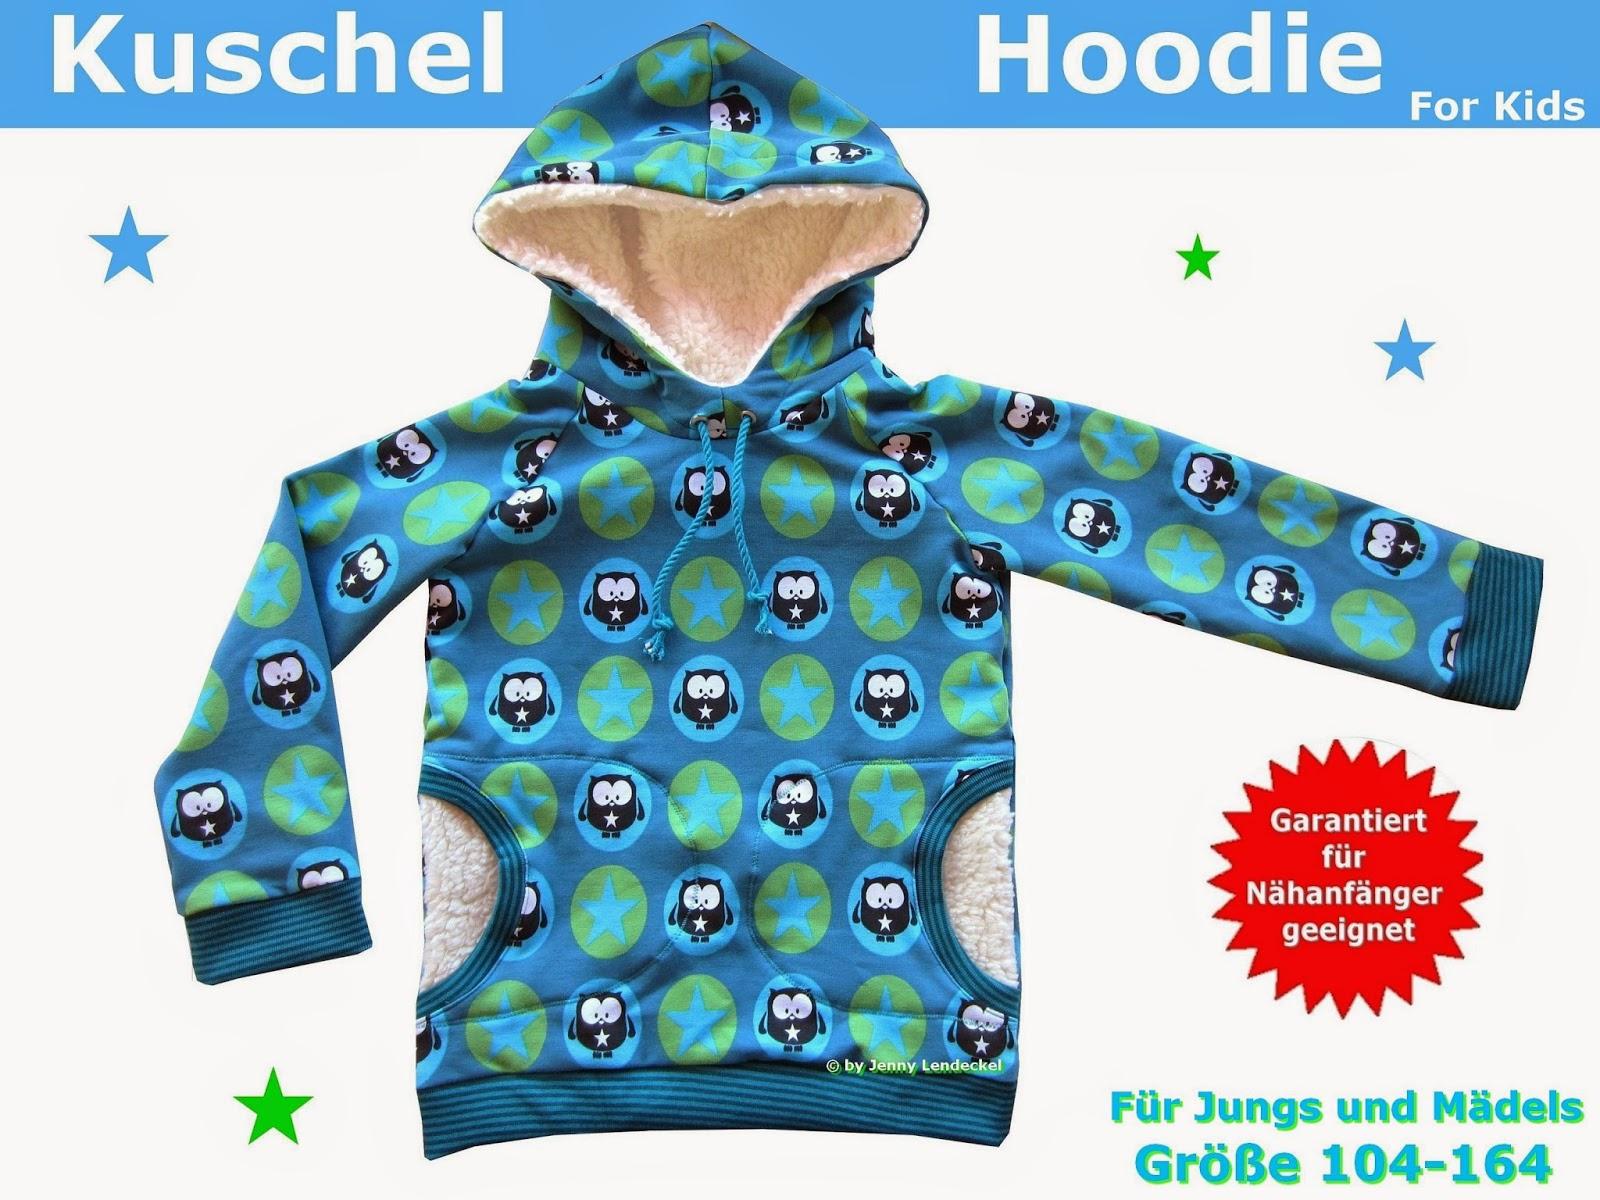 Hoodie/Kapuzenpulli für Kinder nähen,Schnittmuster